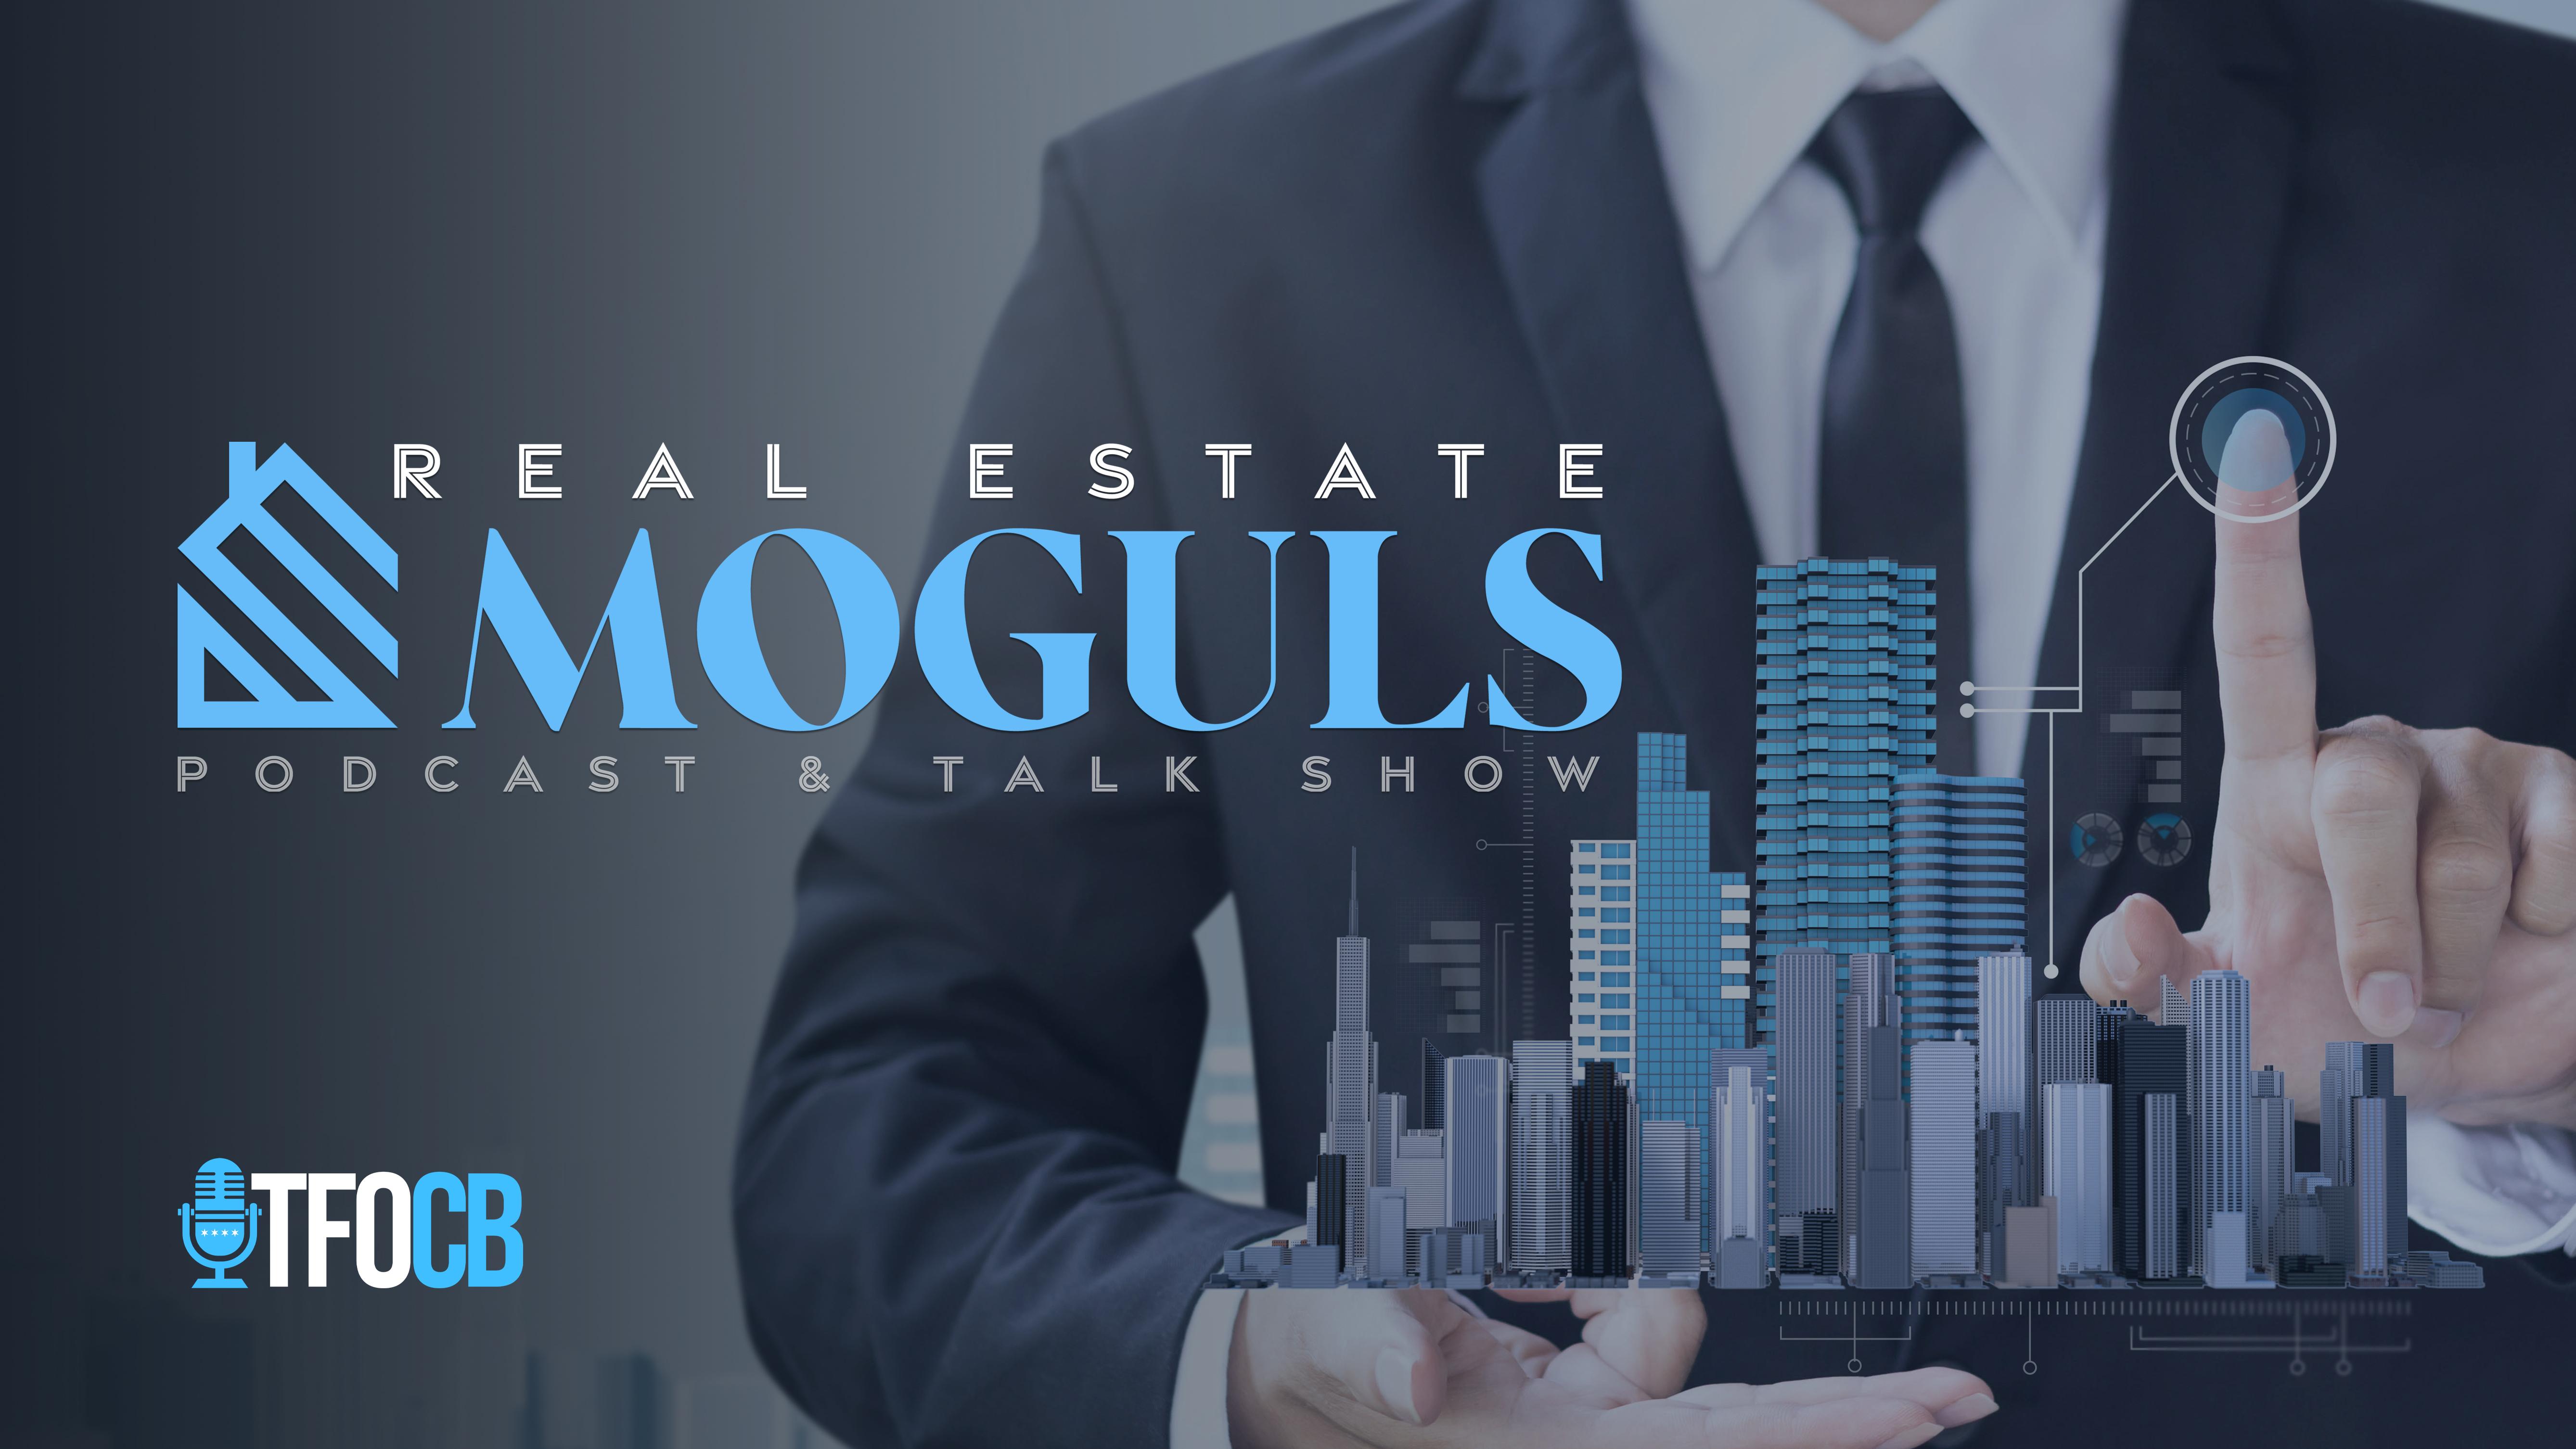 Real Estate Moguls Podcast